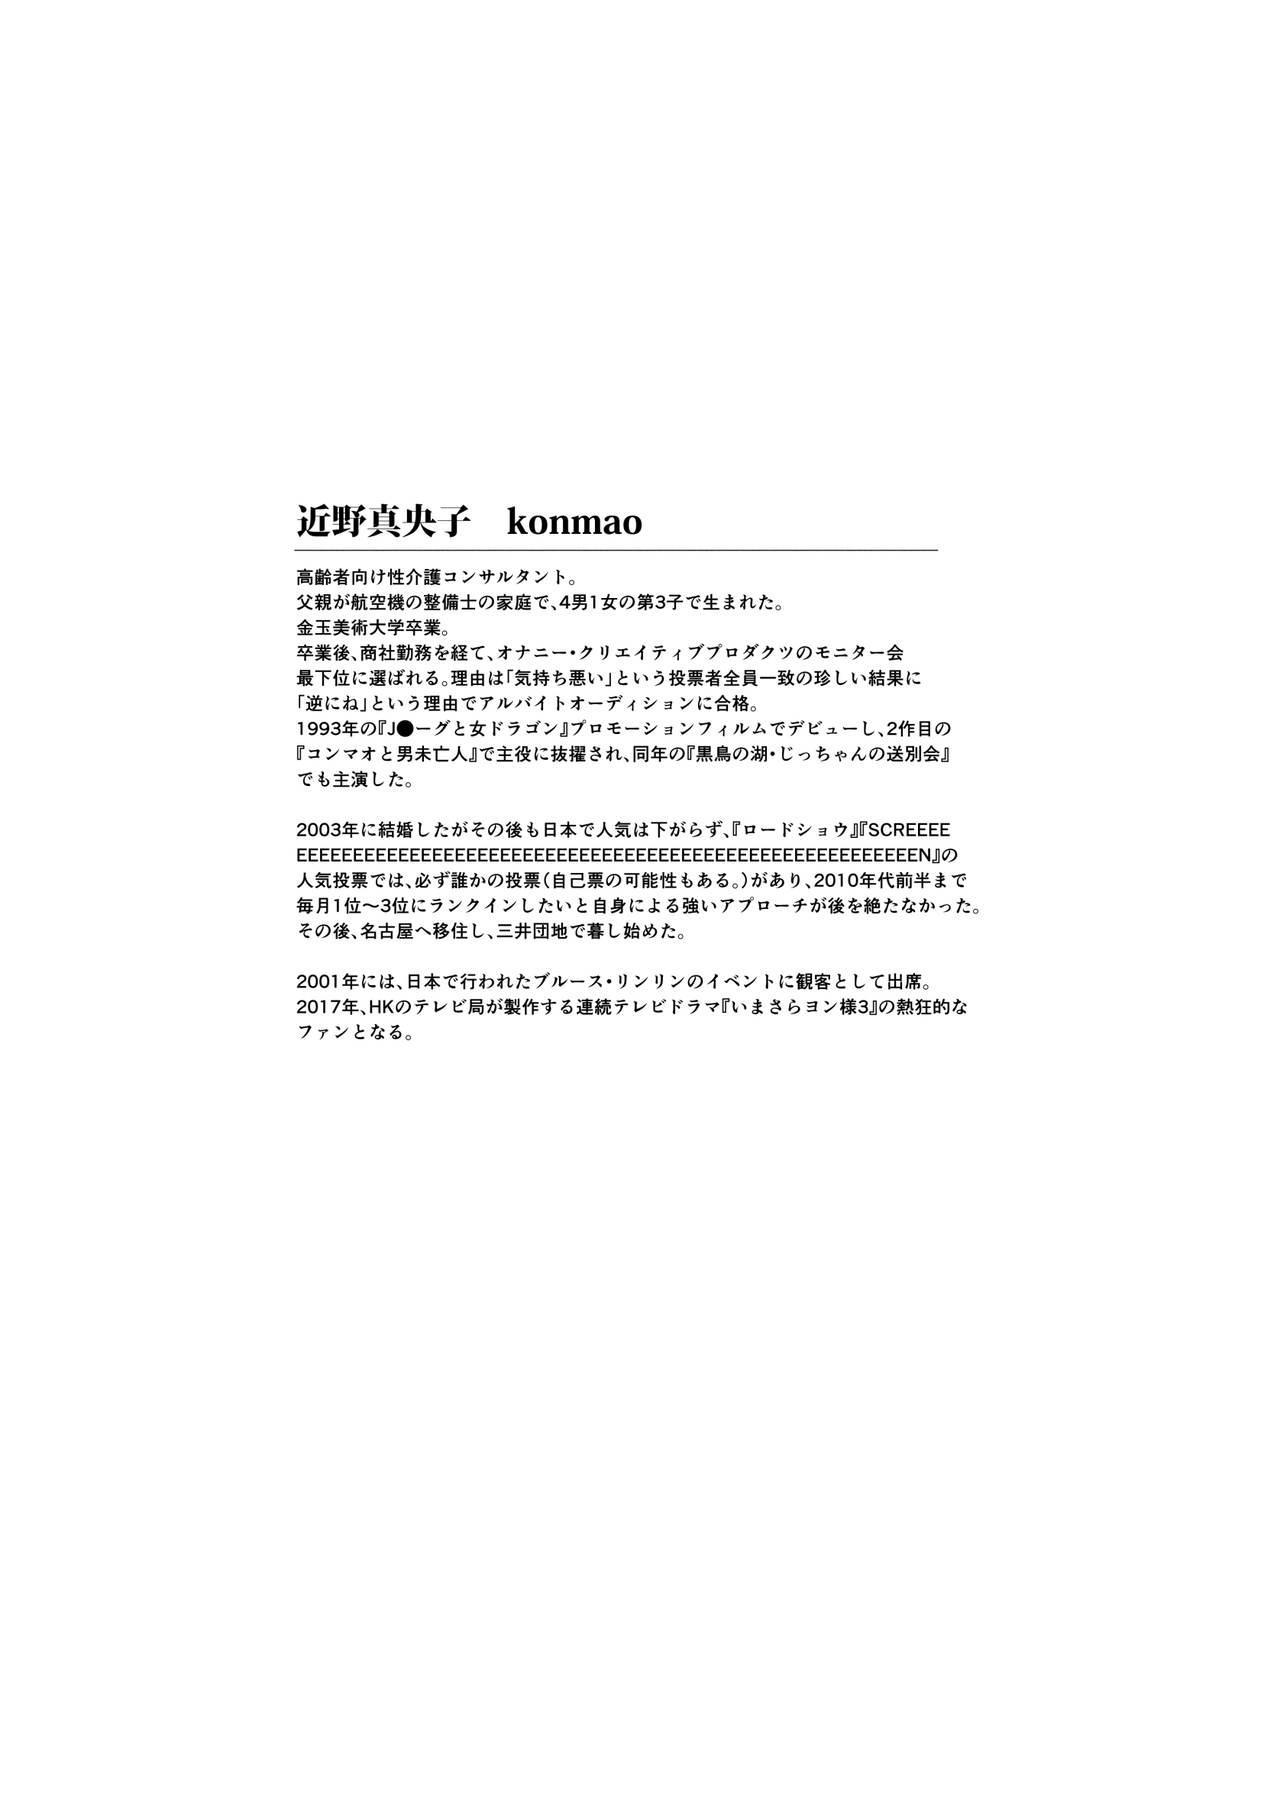 Isogasii Okaasan No Tamuno Sasa Rouzin Seikaigo | Guide for Elderly Sex Health Care to Busy Mom 69